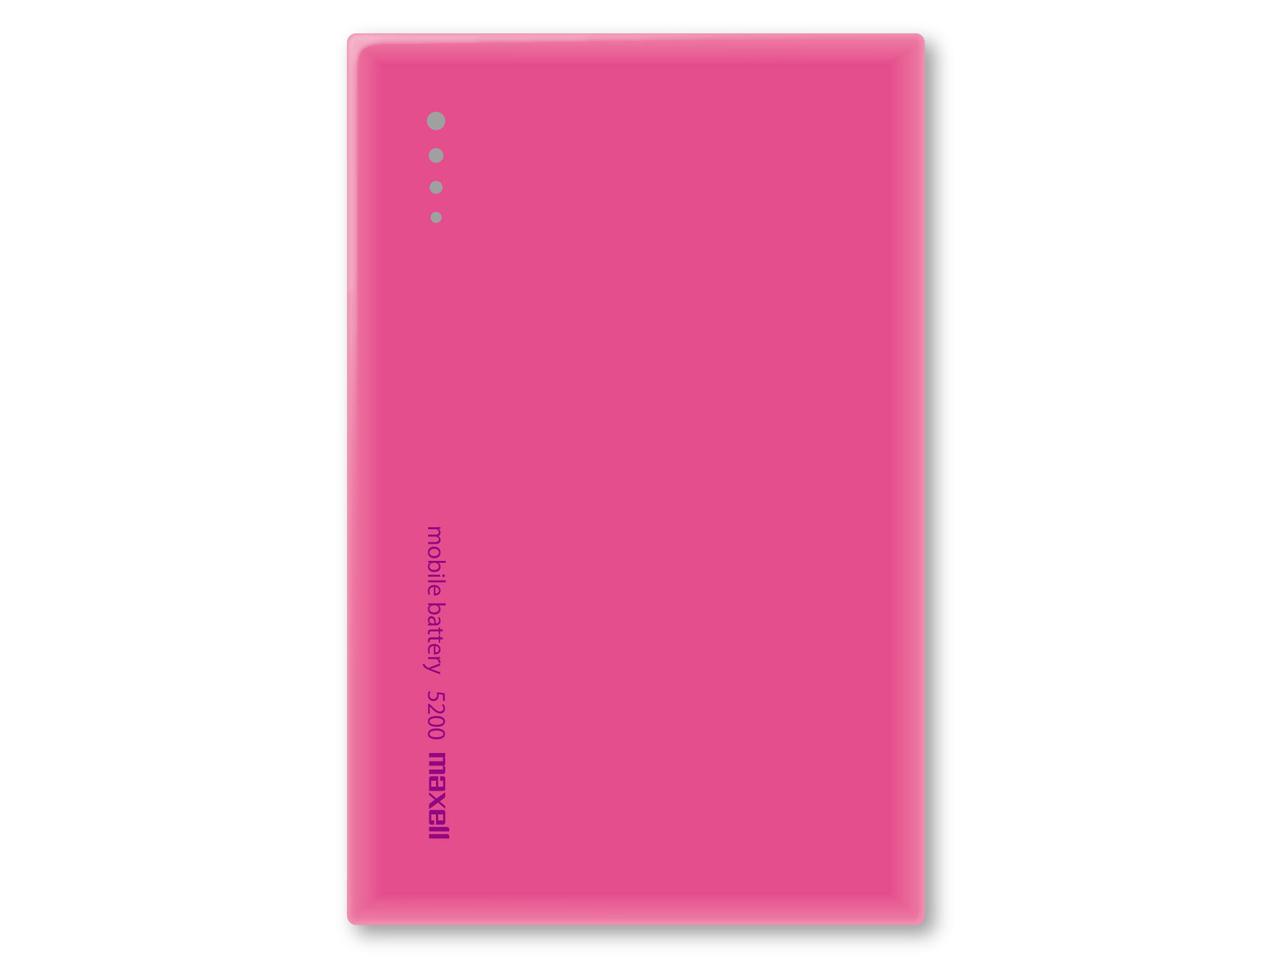 MPC-CW5200PPK [ピンク] の製品画像